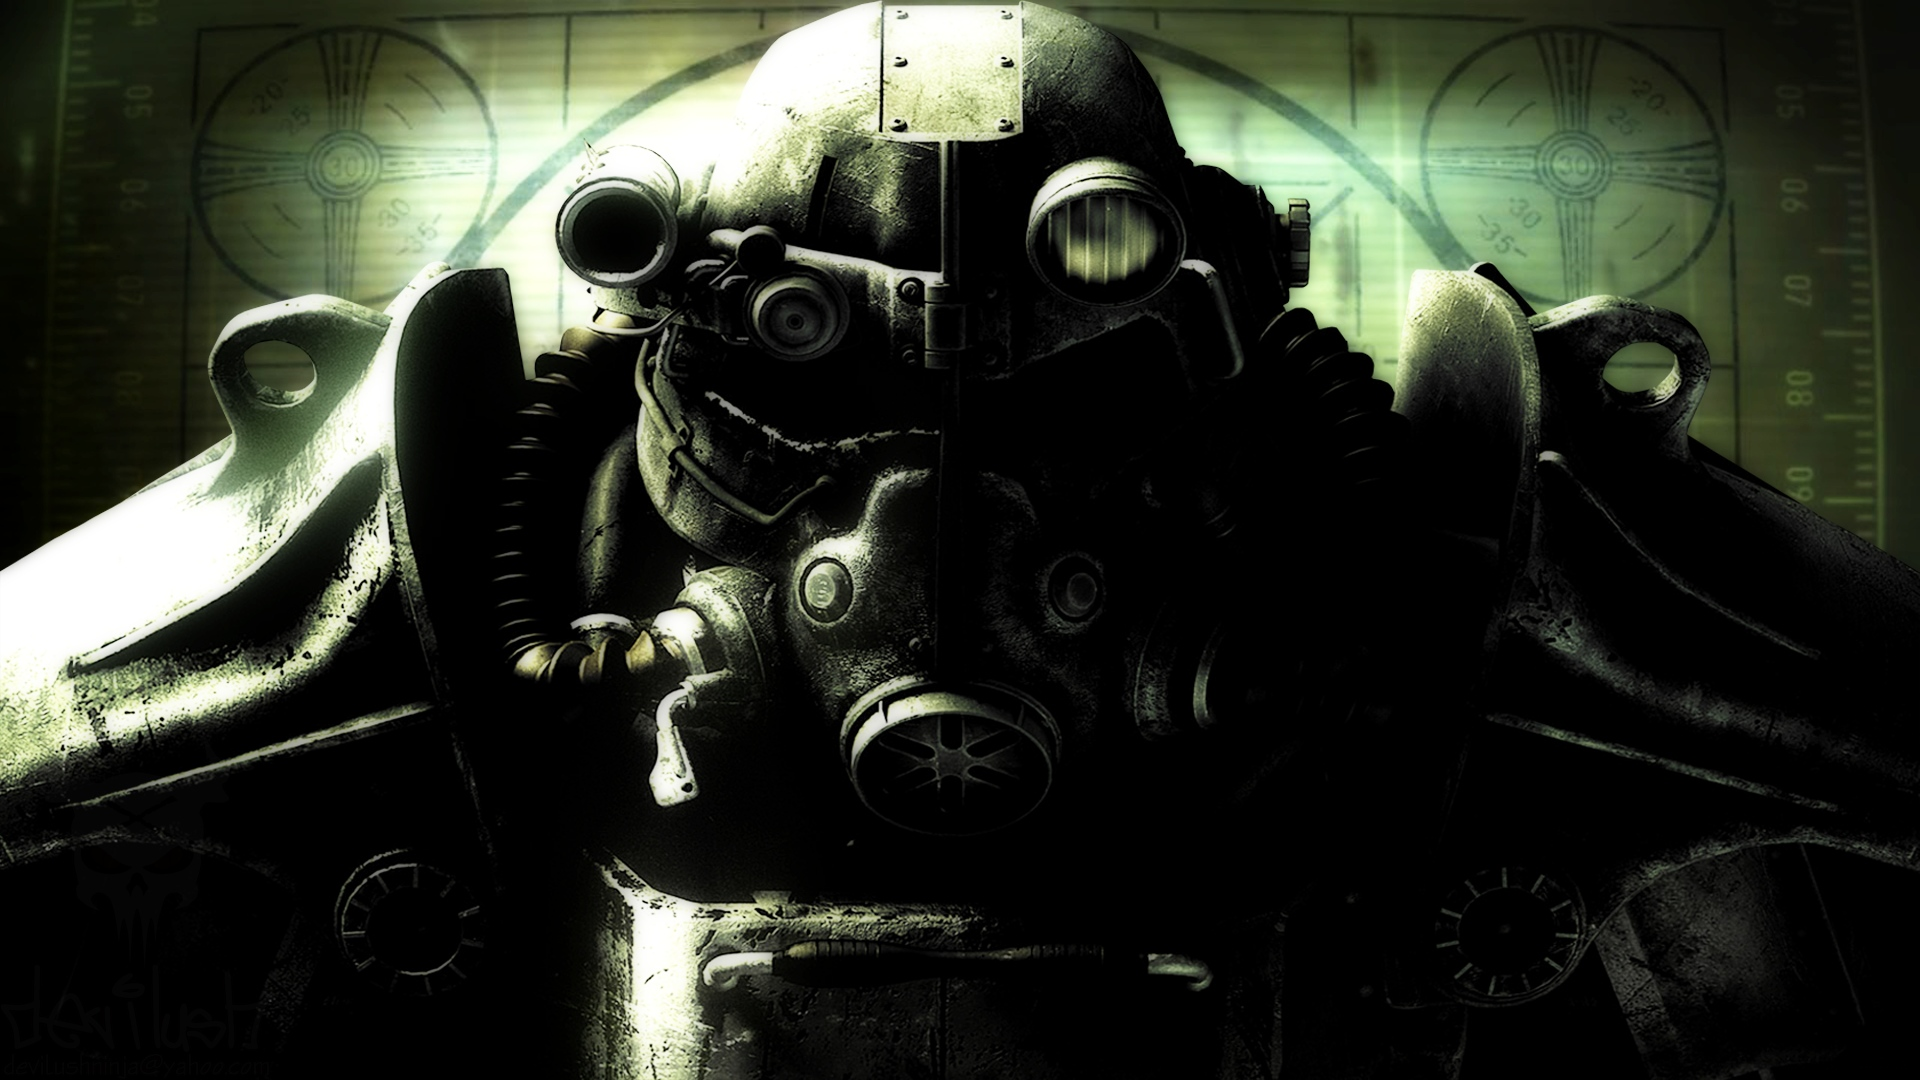 Fall Out Boy Computer Wallpaper Fallout 3 Xbox 360 Nerd Bacon Reviews